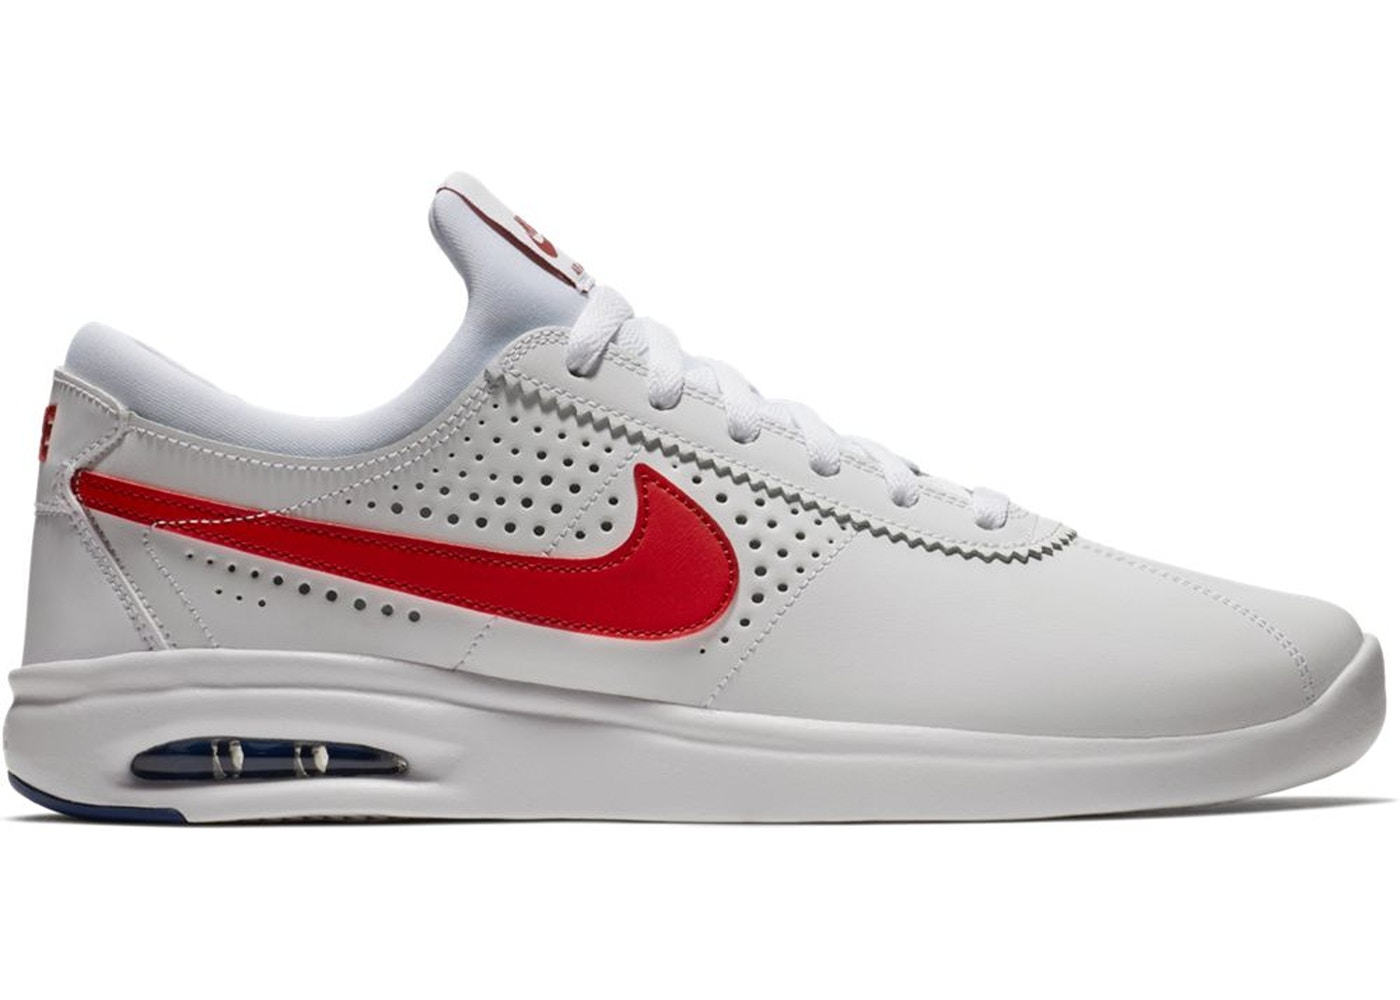 Nike SB Air Max Bruin Vapor White Red - 882097-100